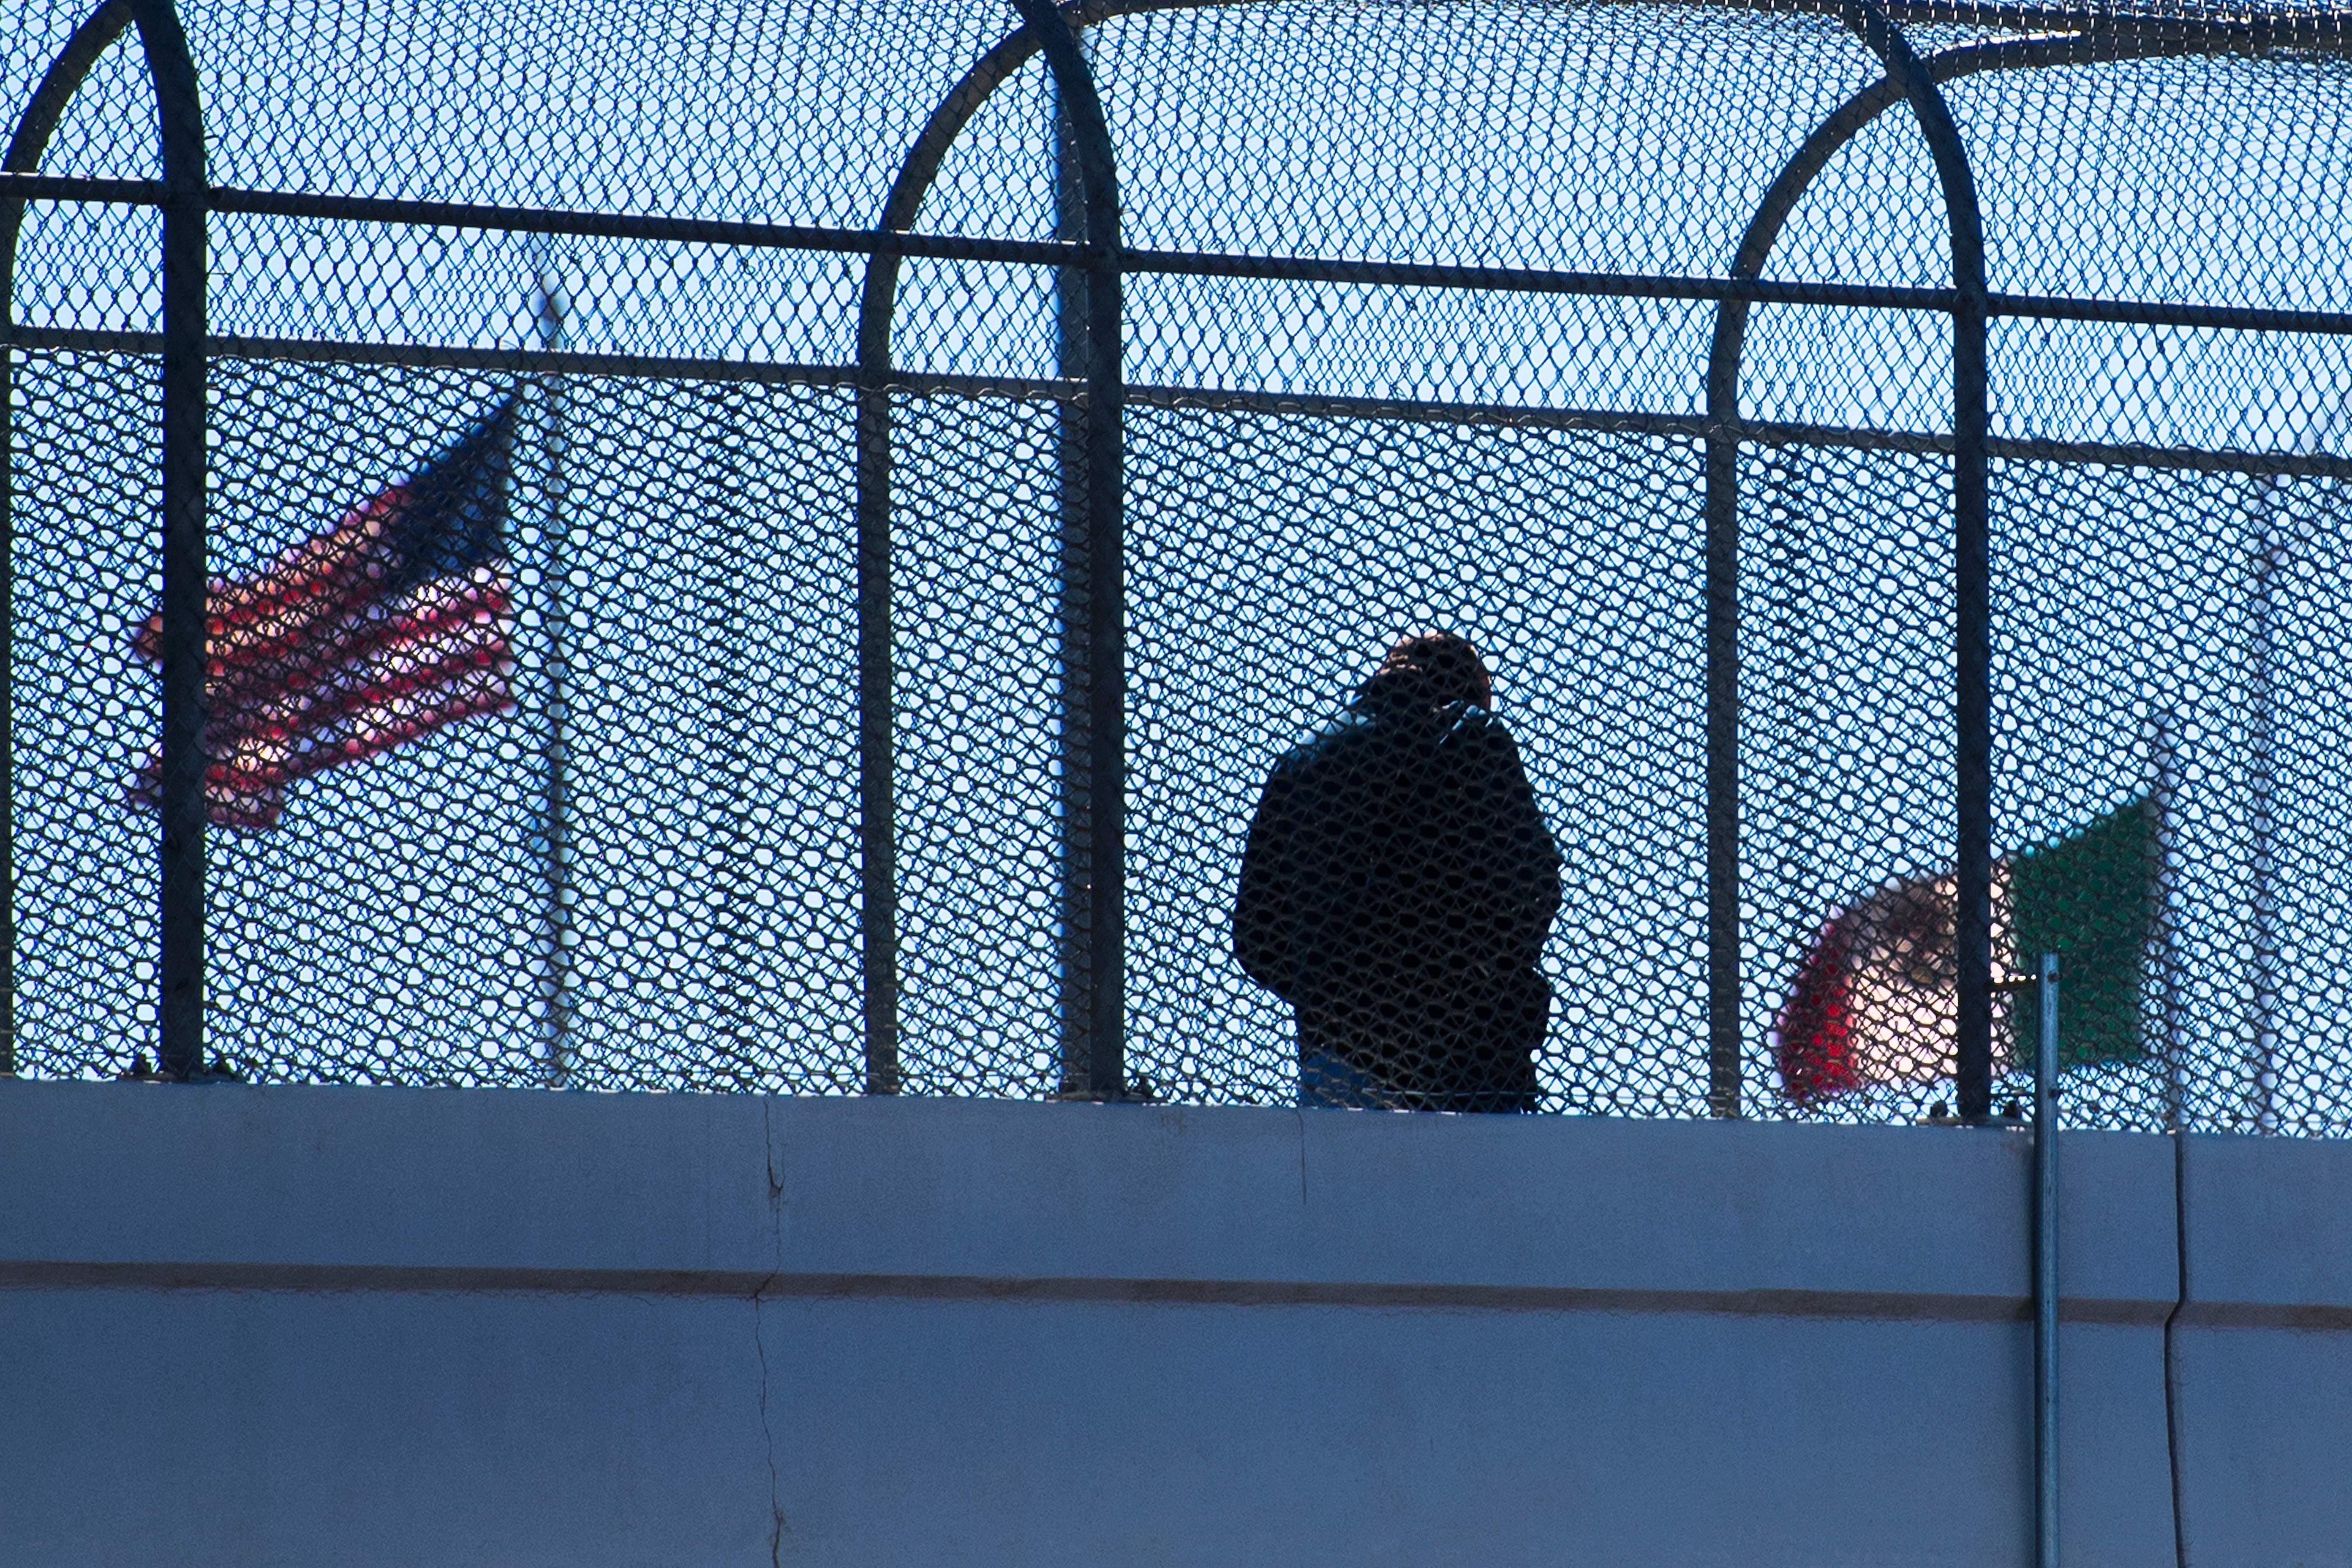 A man crosses the footbridge to Juarez, Mexico, from El Paso, Texas, on February 20, 2017.